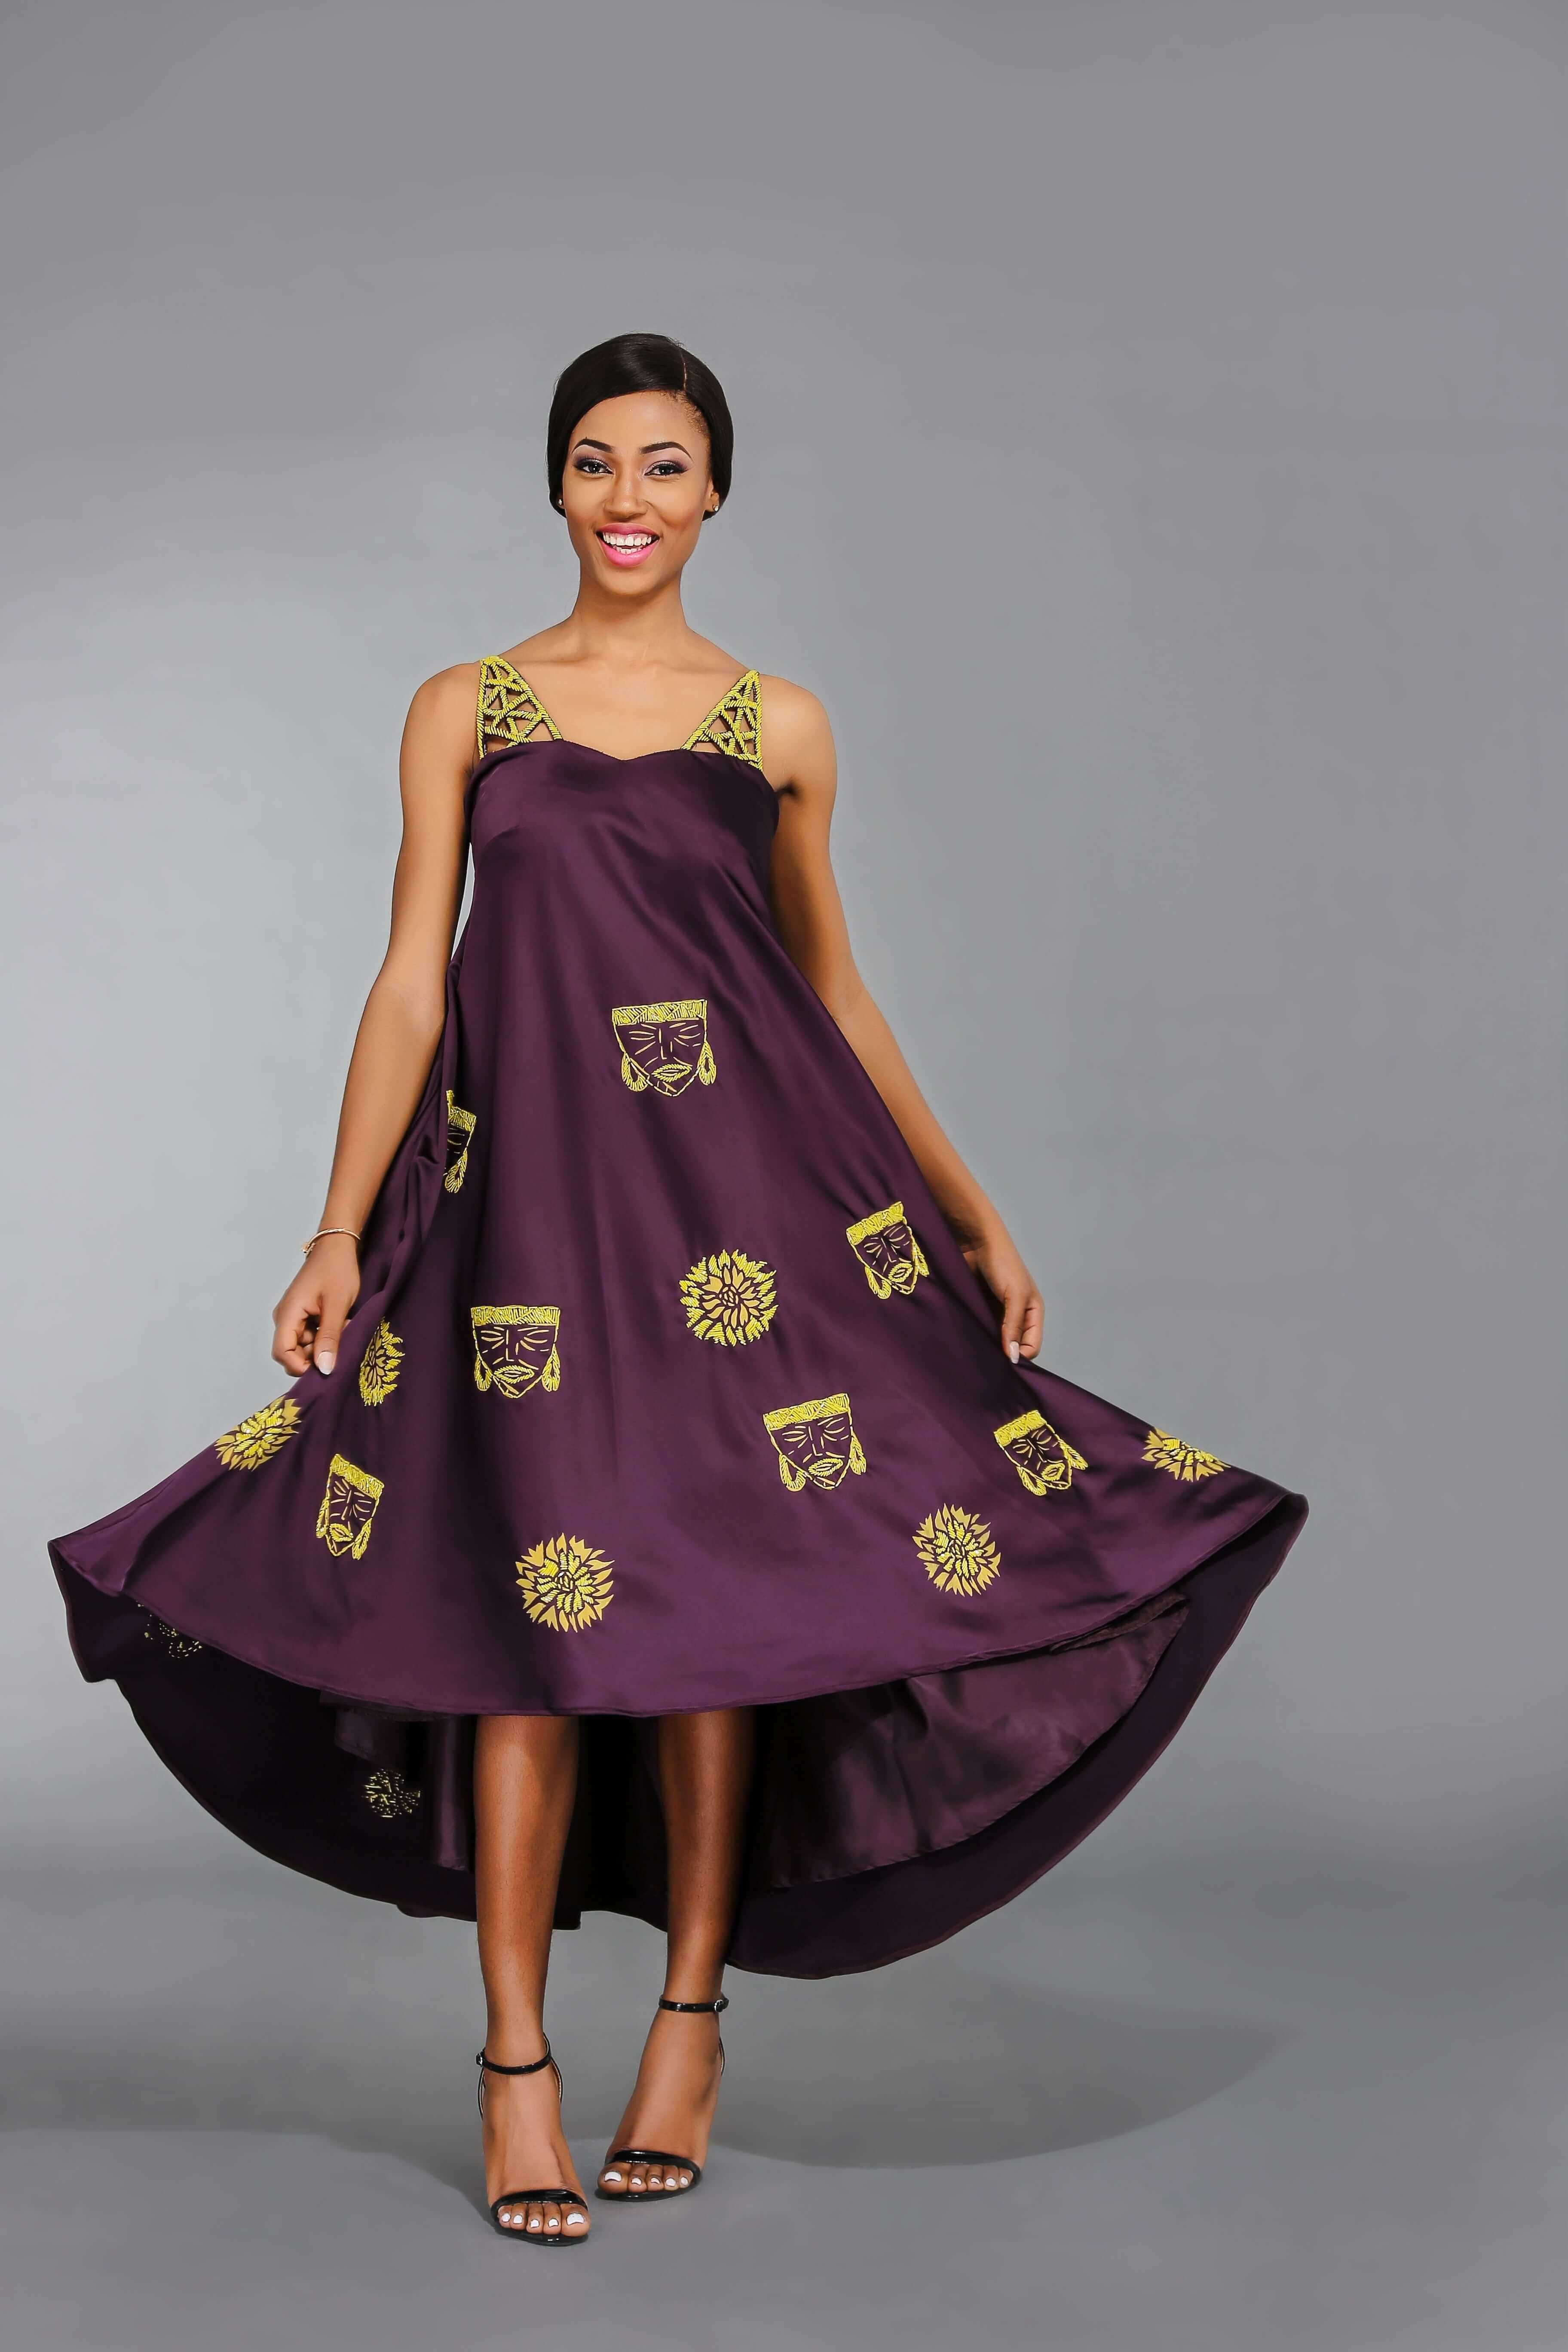 robe africaine moonlook ss15a10 min robes pinterest robe africaine robes et robe. Black Bedroom Furniture Sets. Home Design Ideas